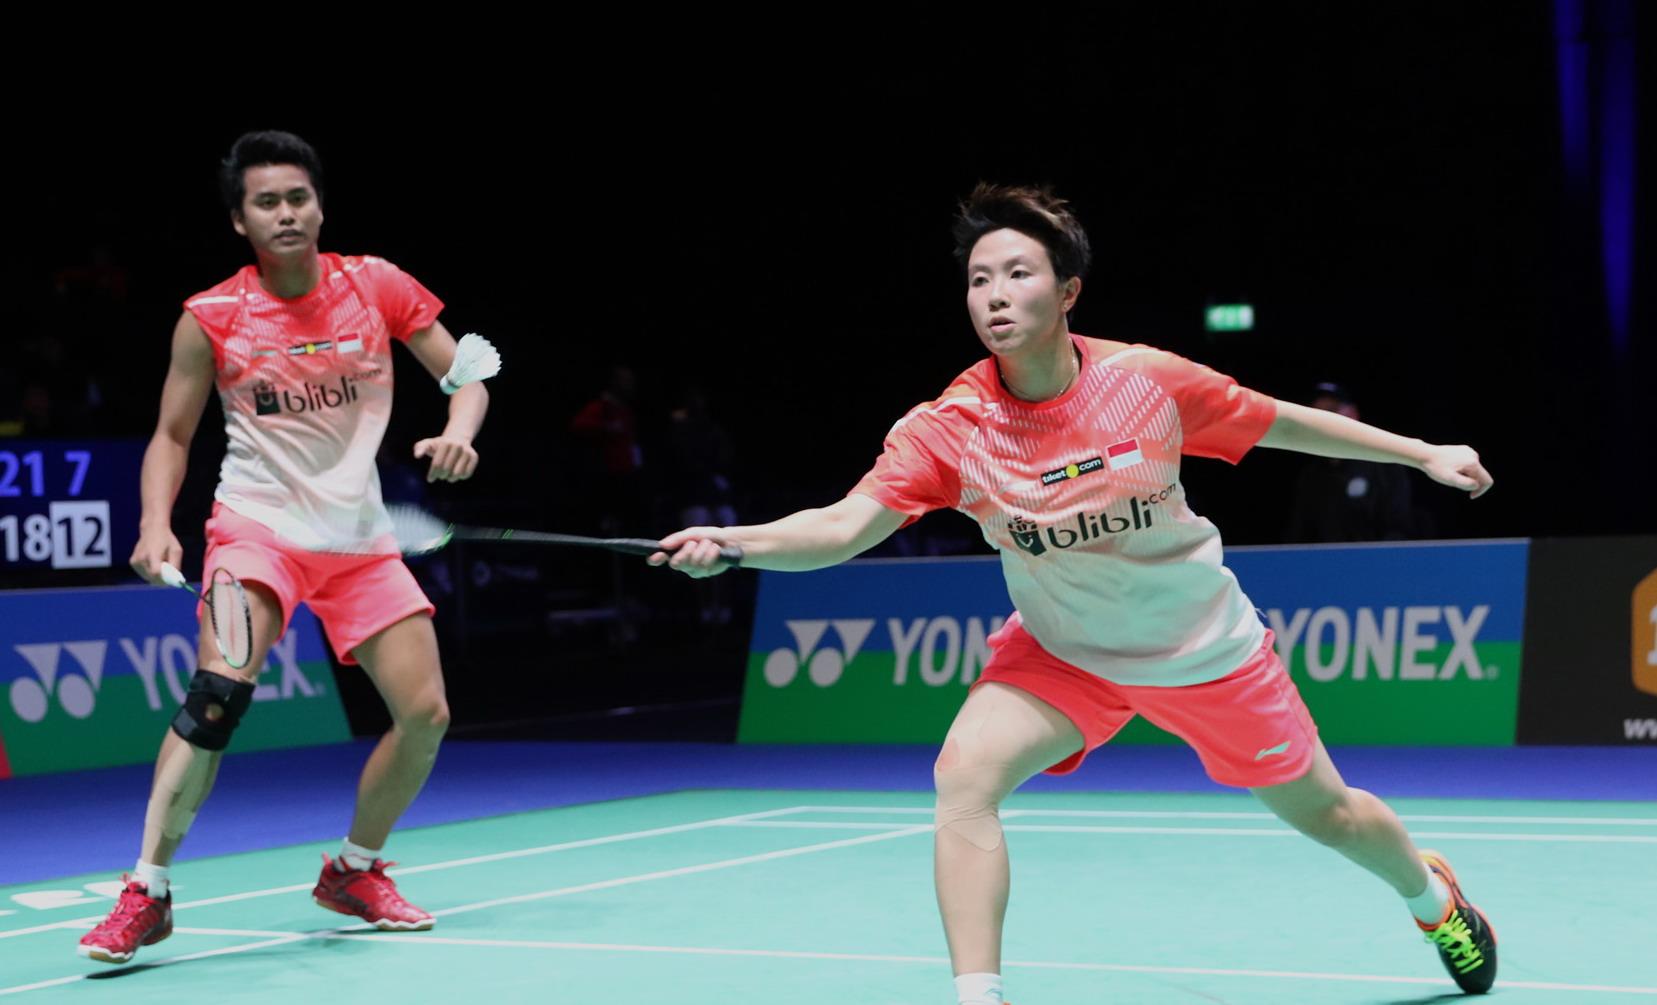 https: img-o.okeinfo.net content 2019 01 27 40 2010079 takluk-dari-wakil-china-tontowi-liliyana-gagal-juarai-indonesia-masters-2019-Tqh8rhtLaN.jpg